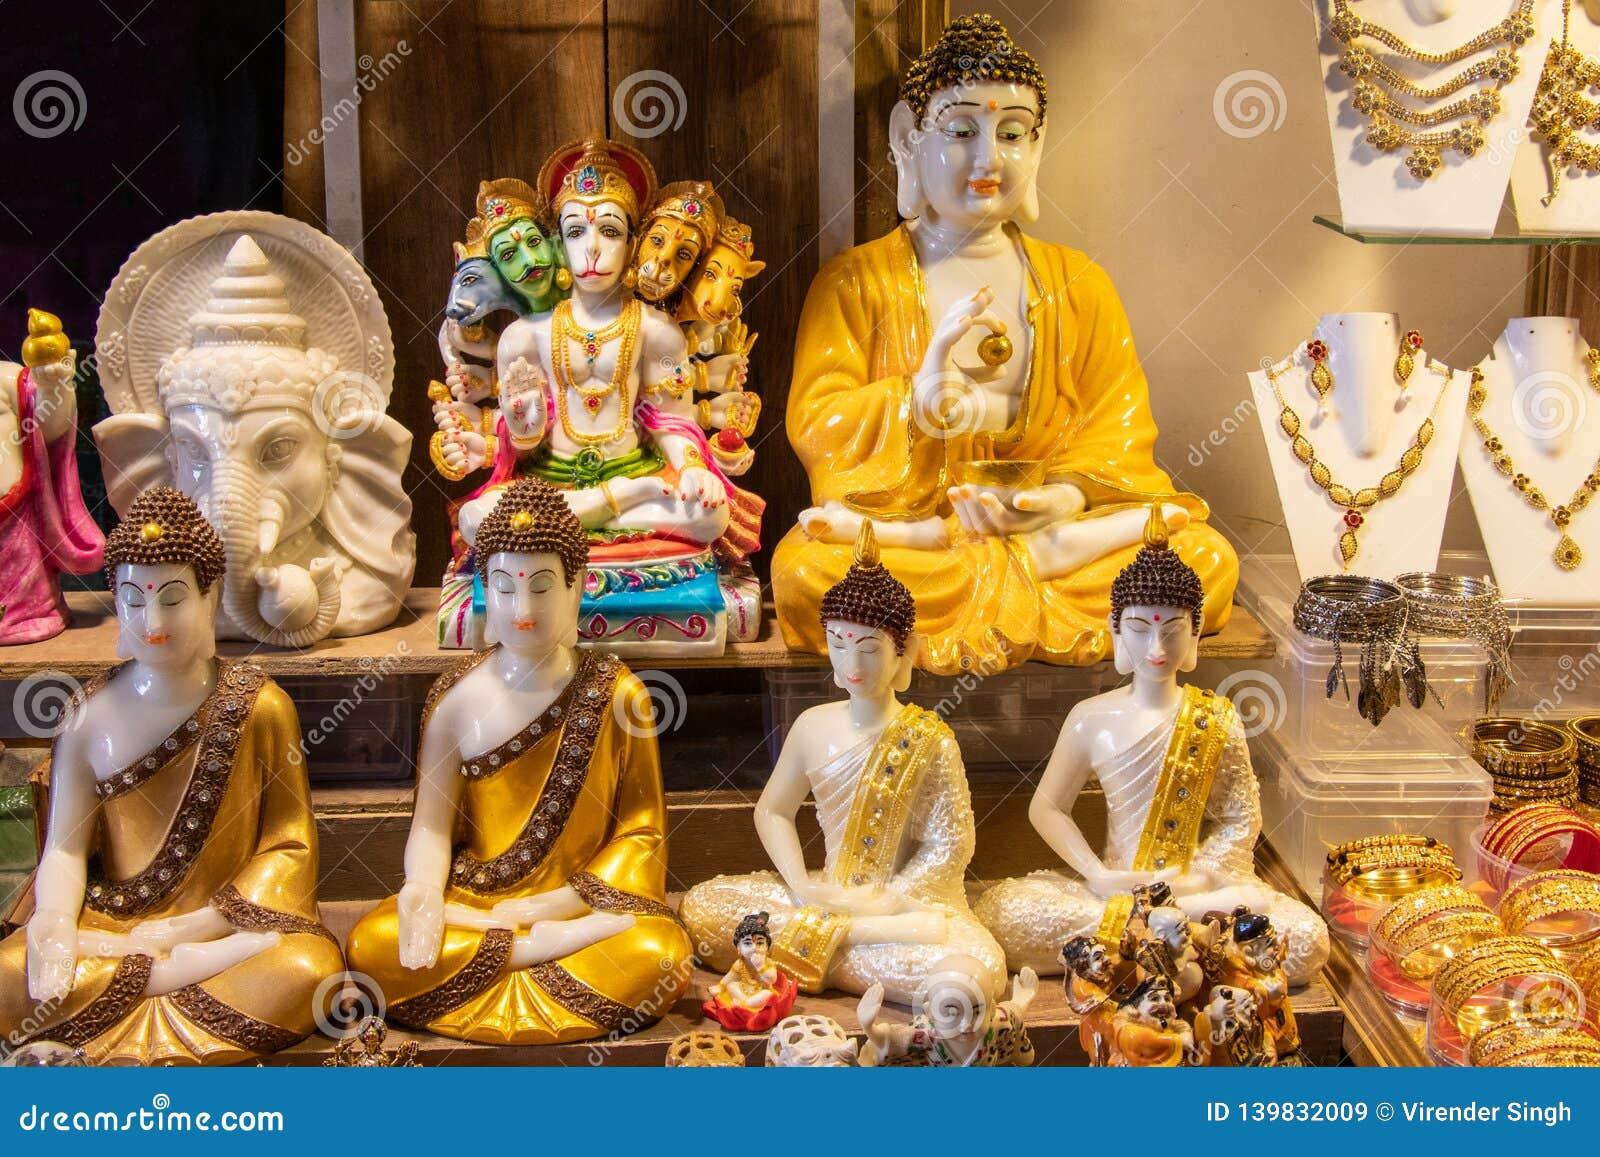 上帝菩萨和神ganesh雕象